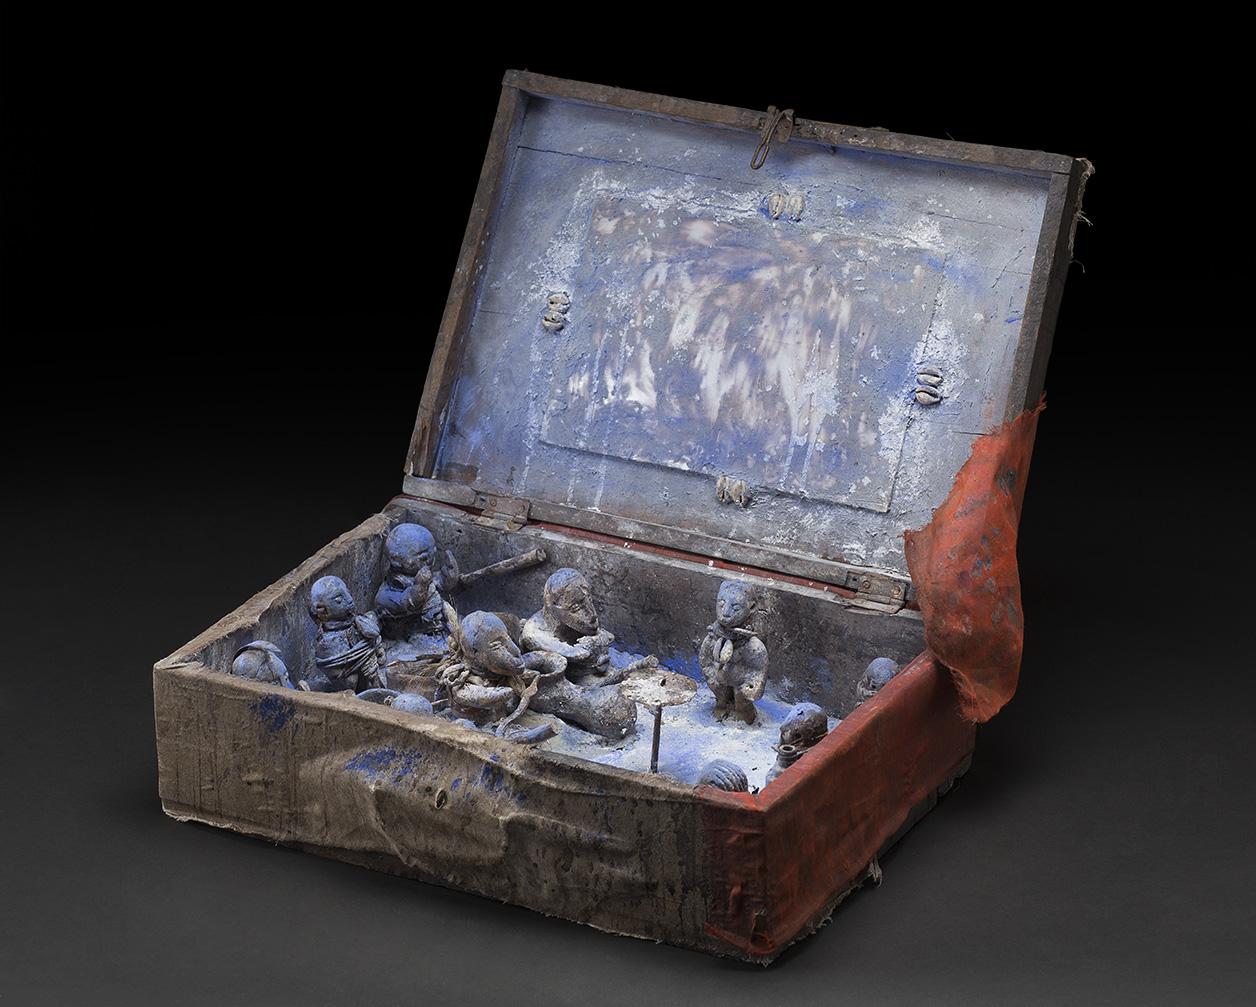 Africa,   Portable Vodun Altar - Fon people - Benin  , Mid. 20th C.,Wood, clay, metal, pigment, shells, mirror,19.5 x 14 x 6.5 inches,Af 354